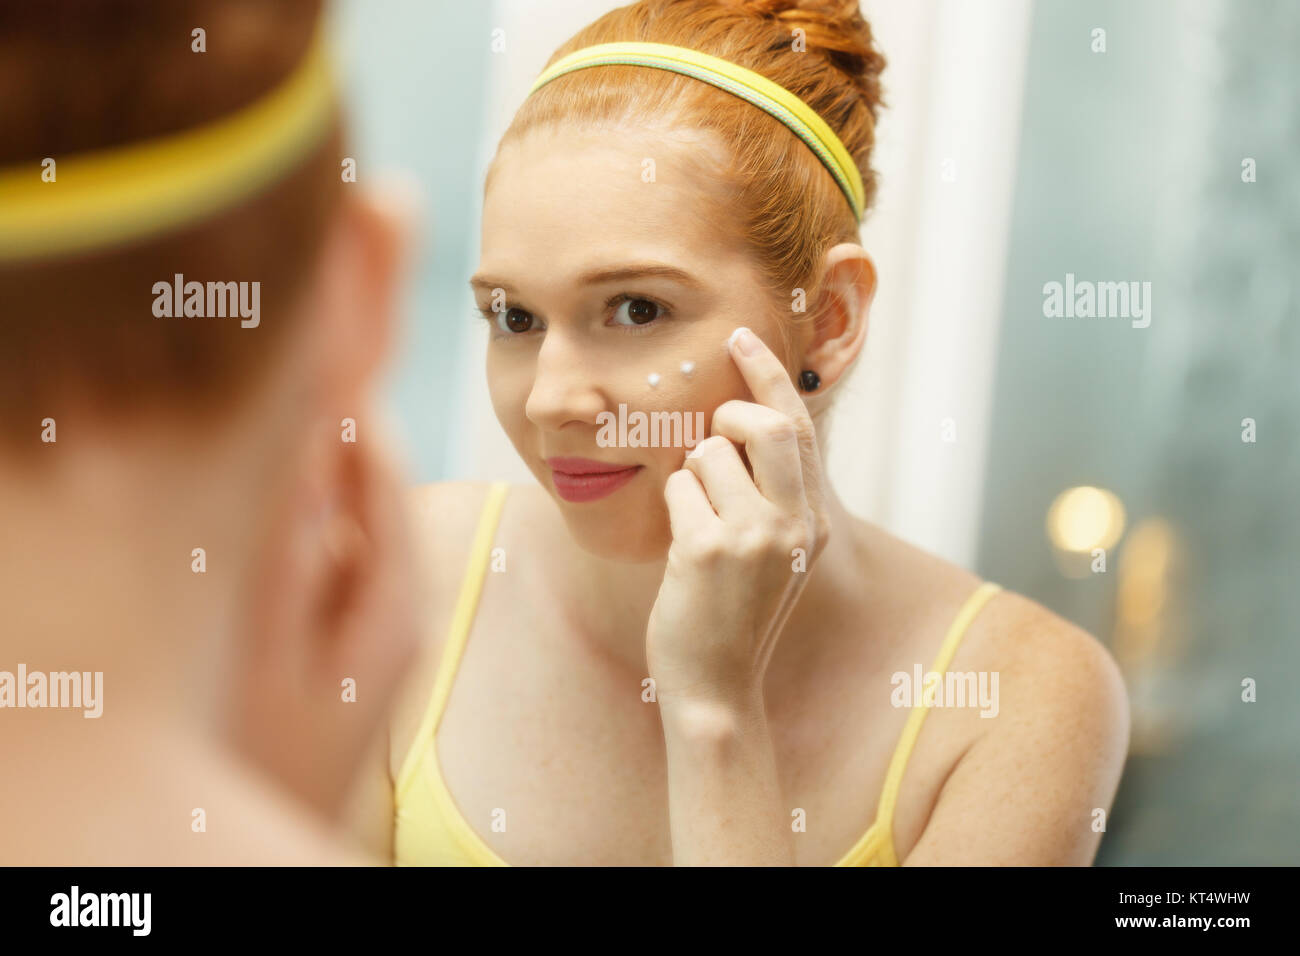 Redhead girl applying lipstick in accueil salle de bains au matin. Jeune femme en prenant soin de sa peau, à Photo Stock